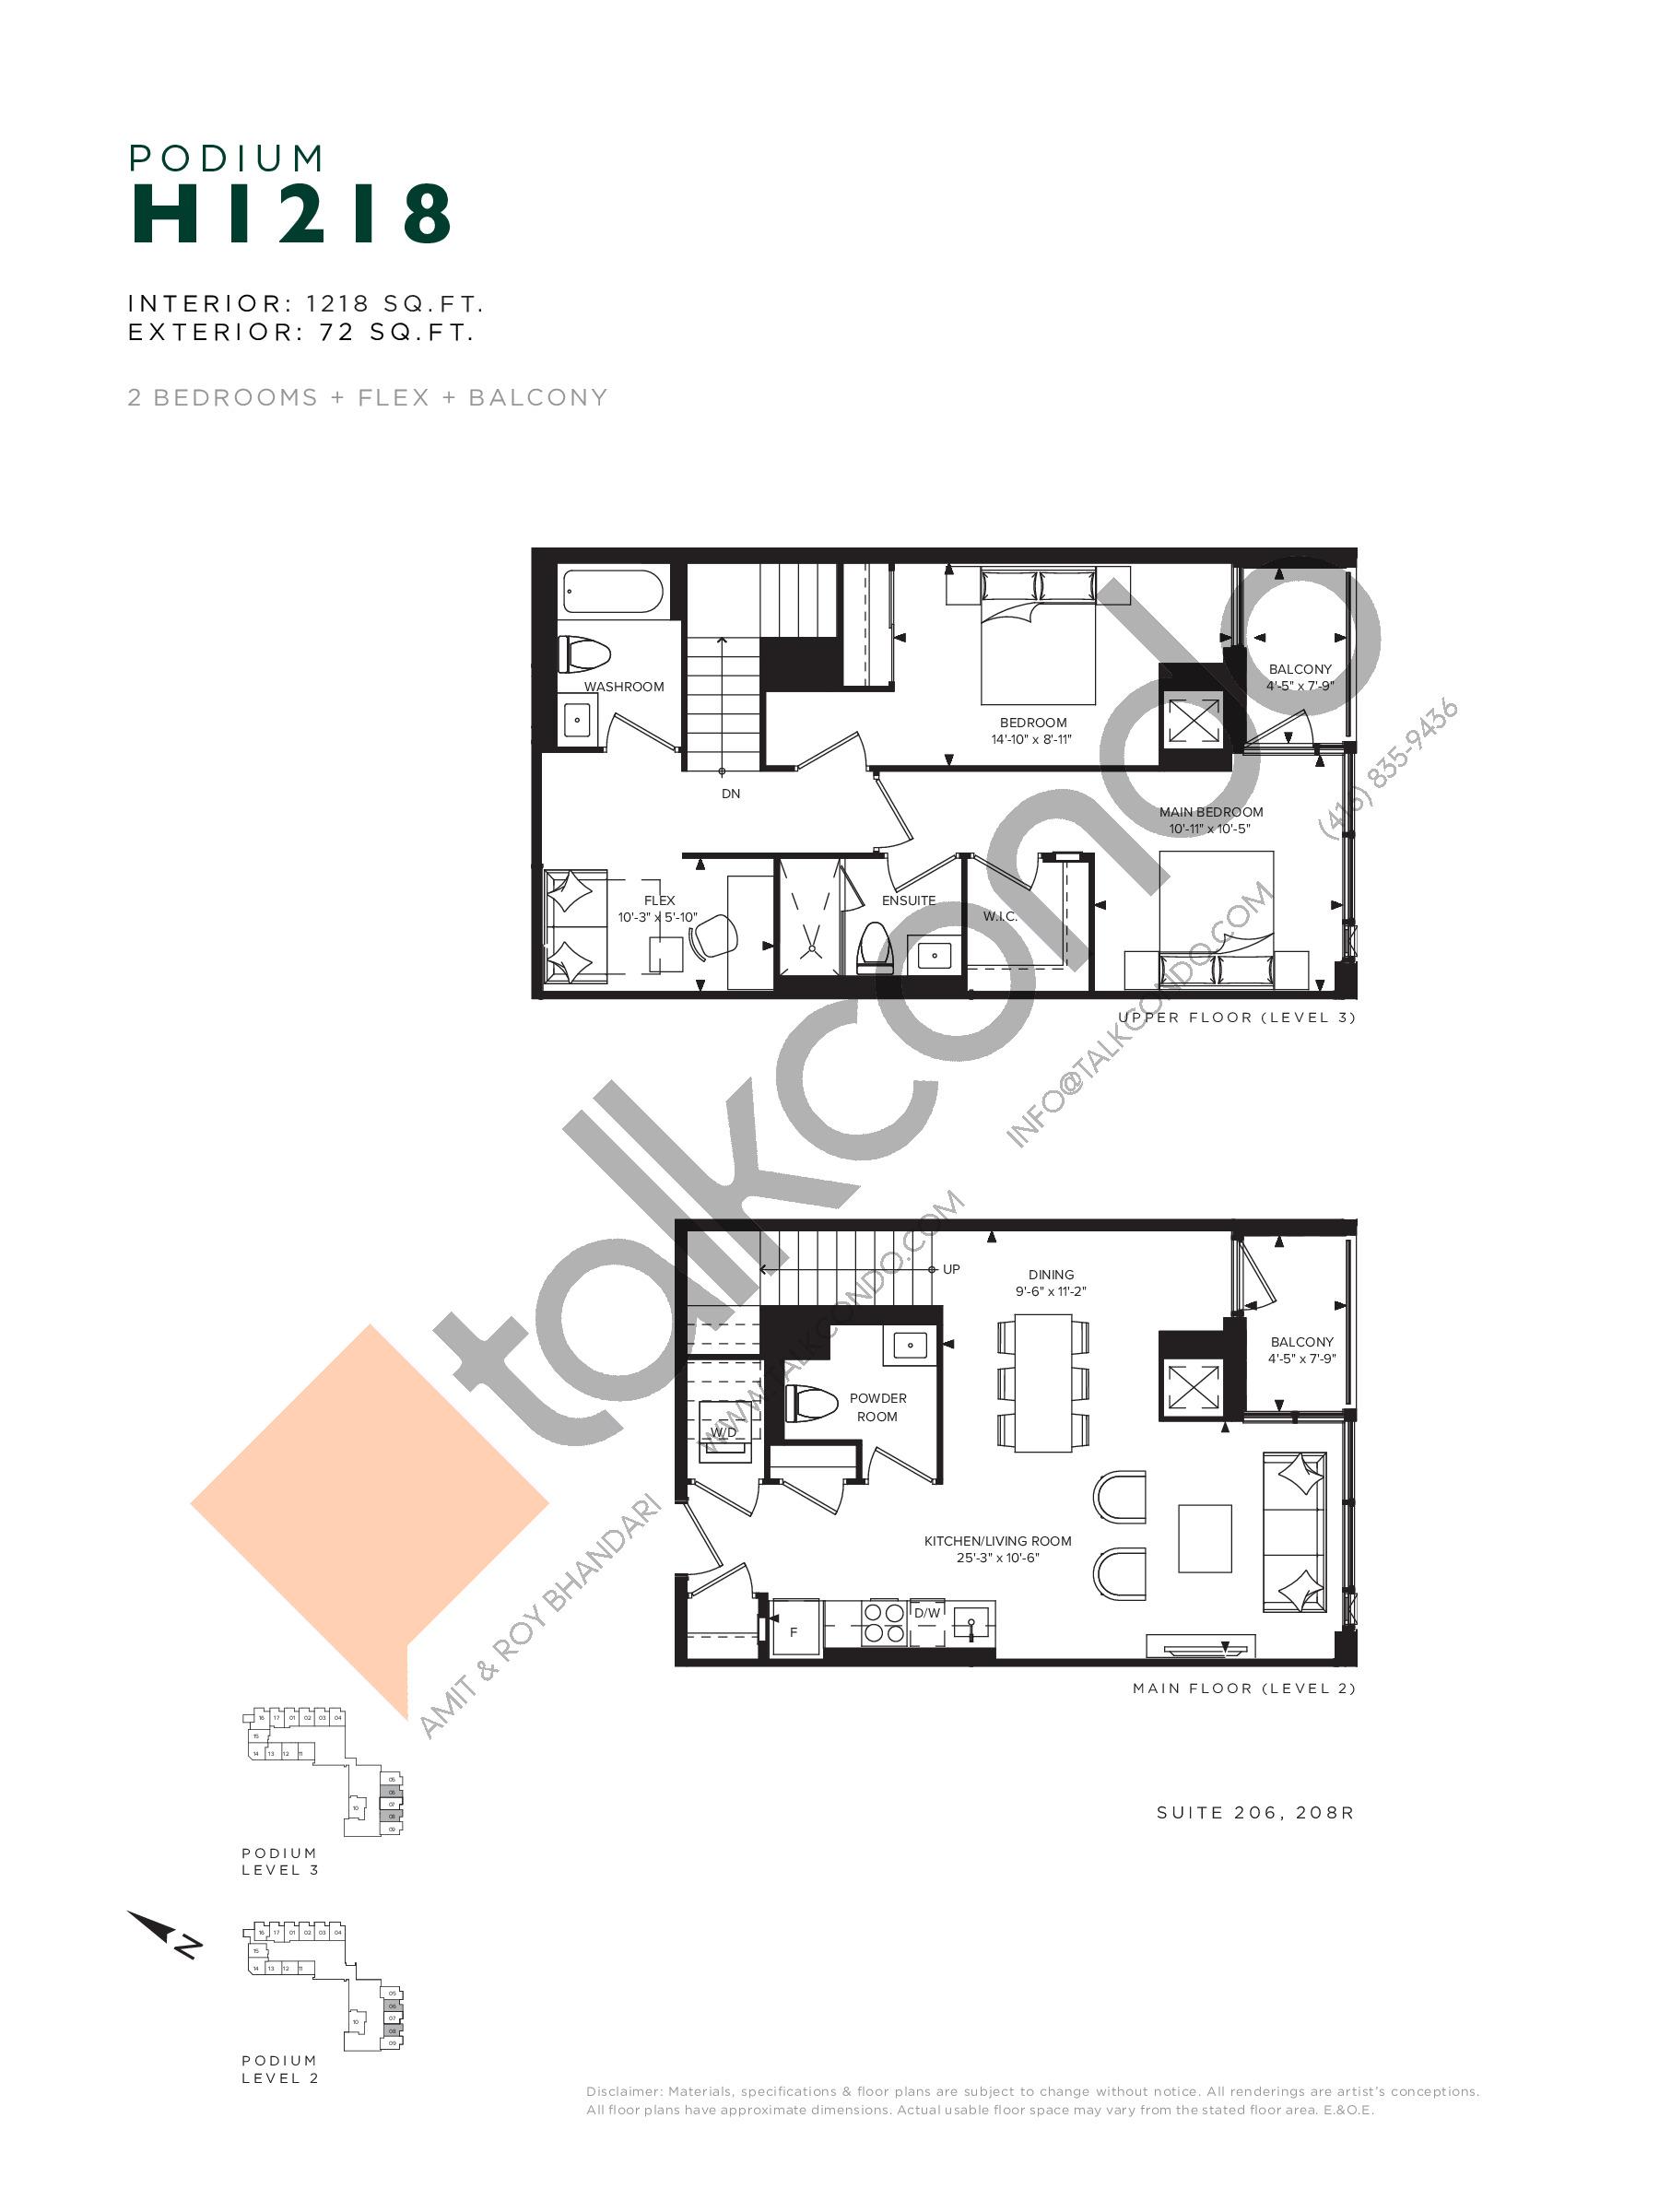 H1218 (Podium) Floor Plan at Hillmont at SXSW Condos - 1218 sq.ft